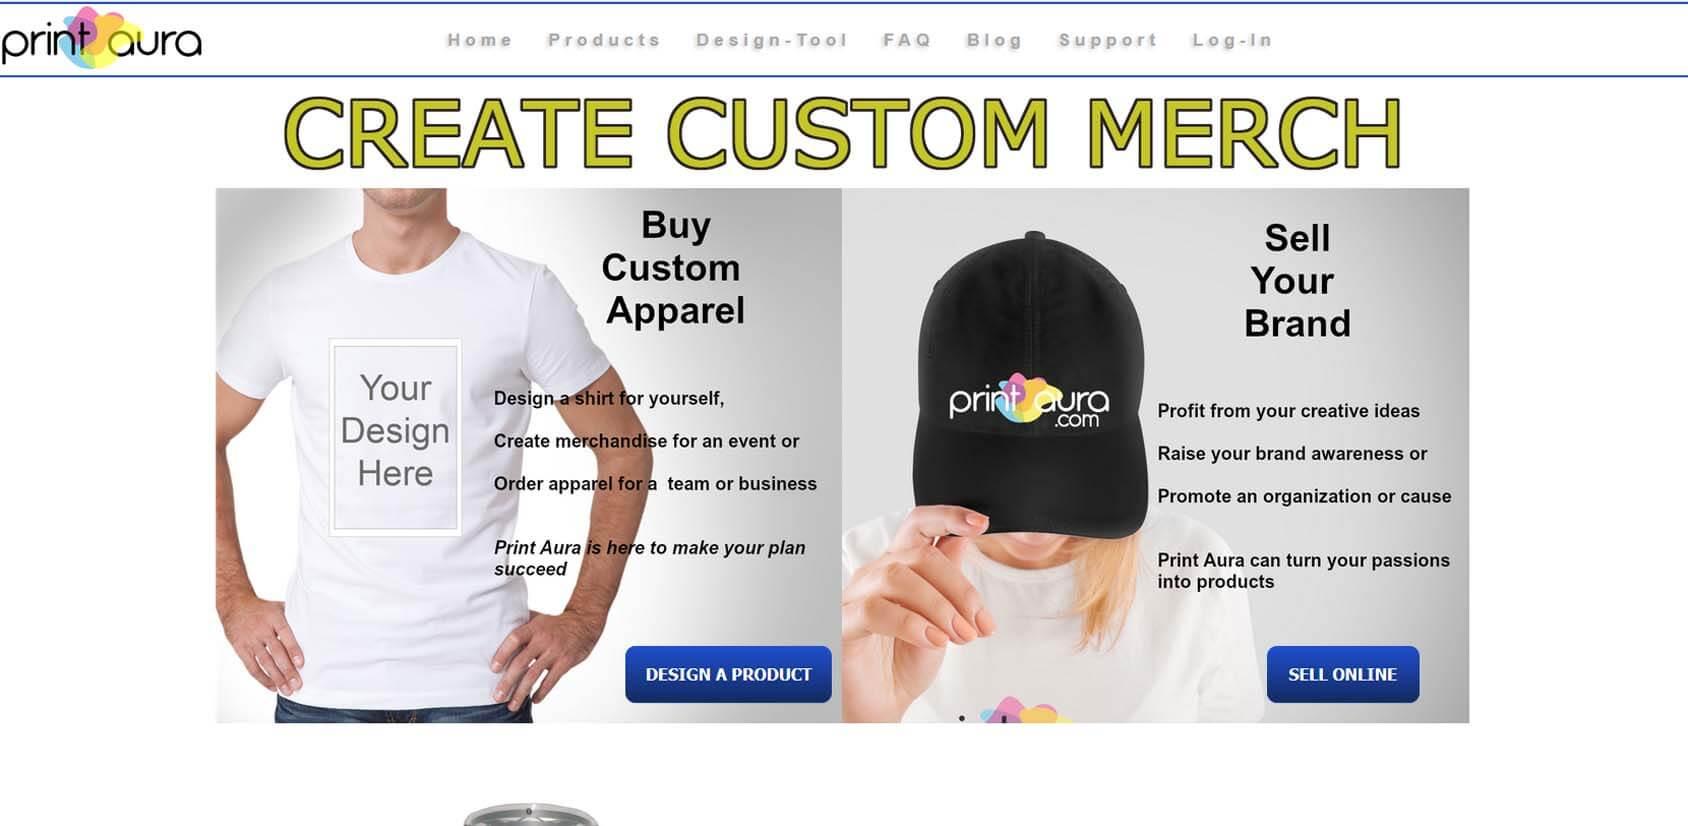 Print Aura Homepage